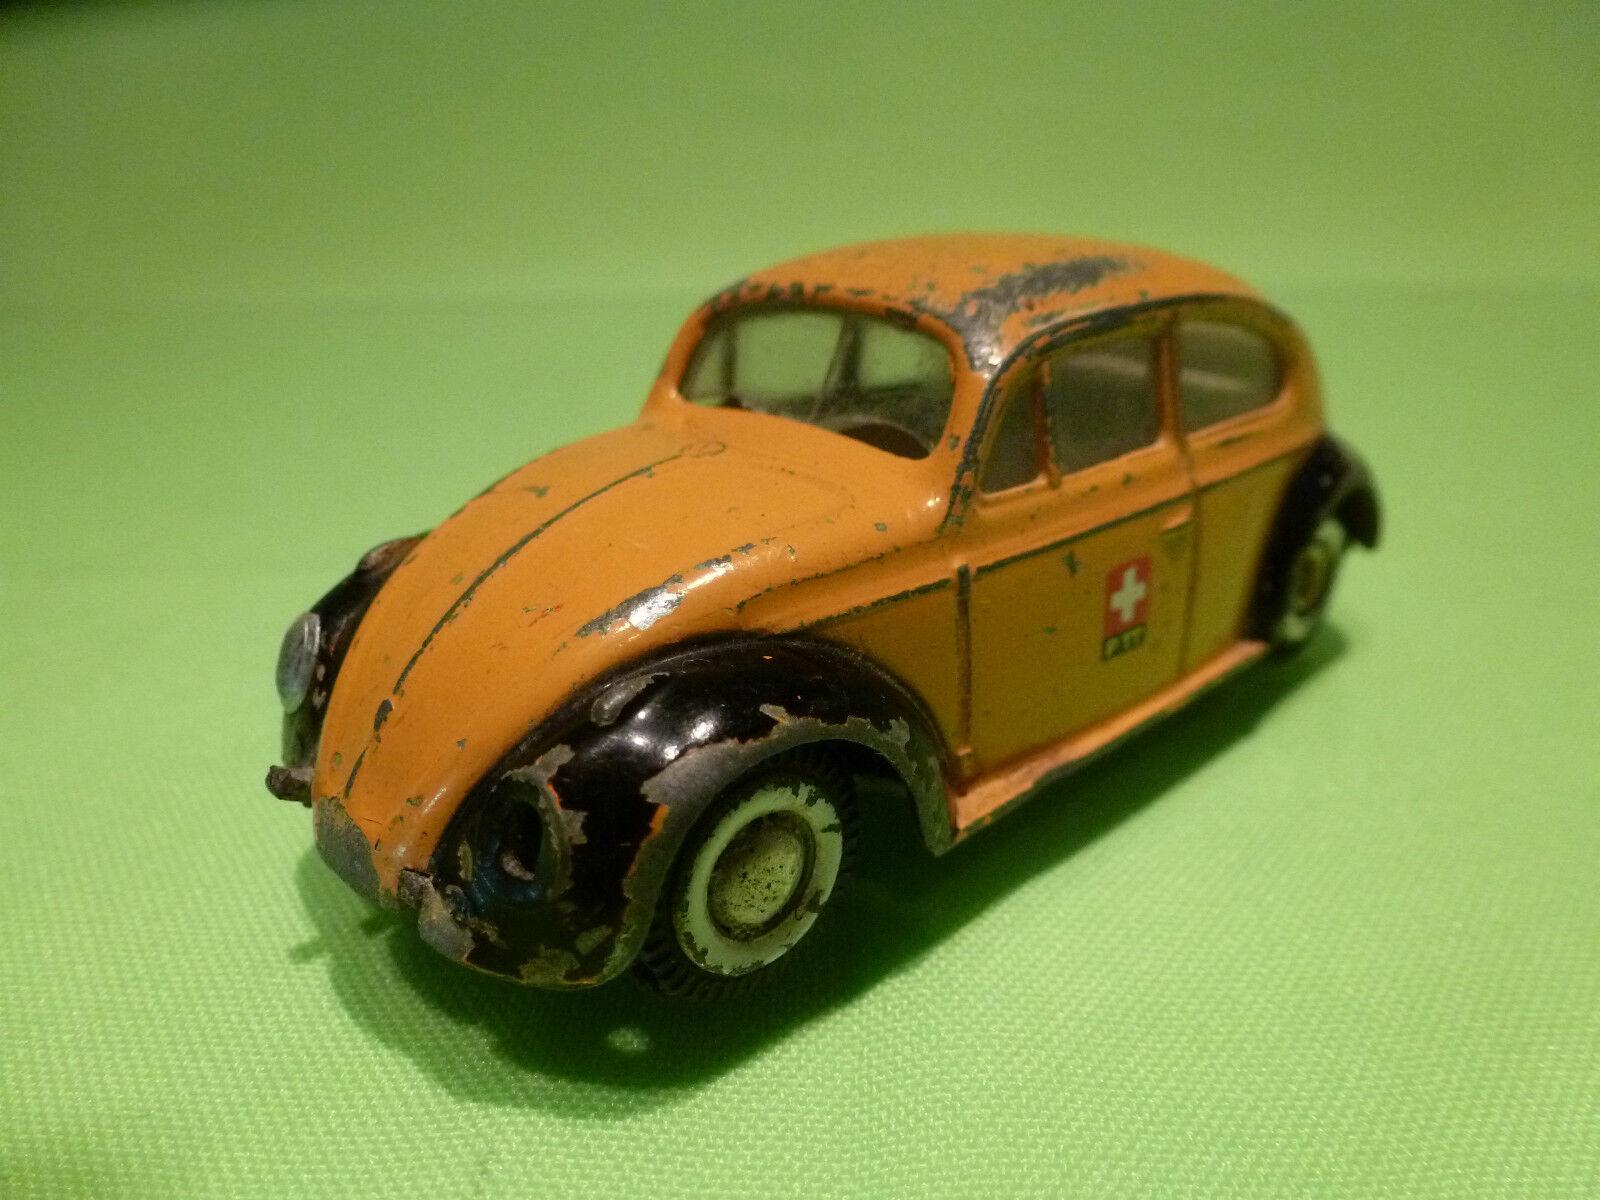 TEKNO DENMARK 819 VW VOLKSWAGEN - SWISS PTT 1:43 - RARE SELTEN - NICE CONDITION